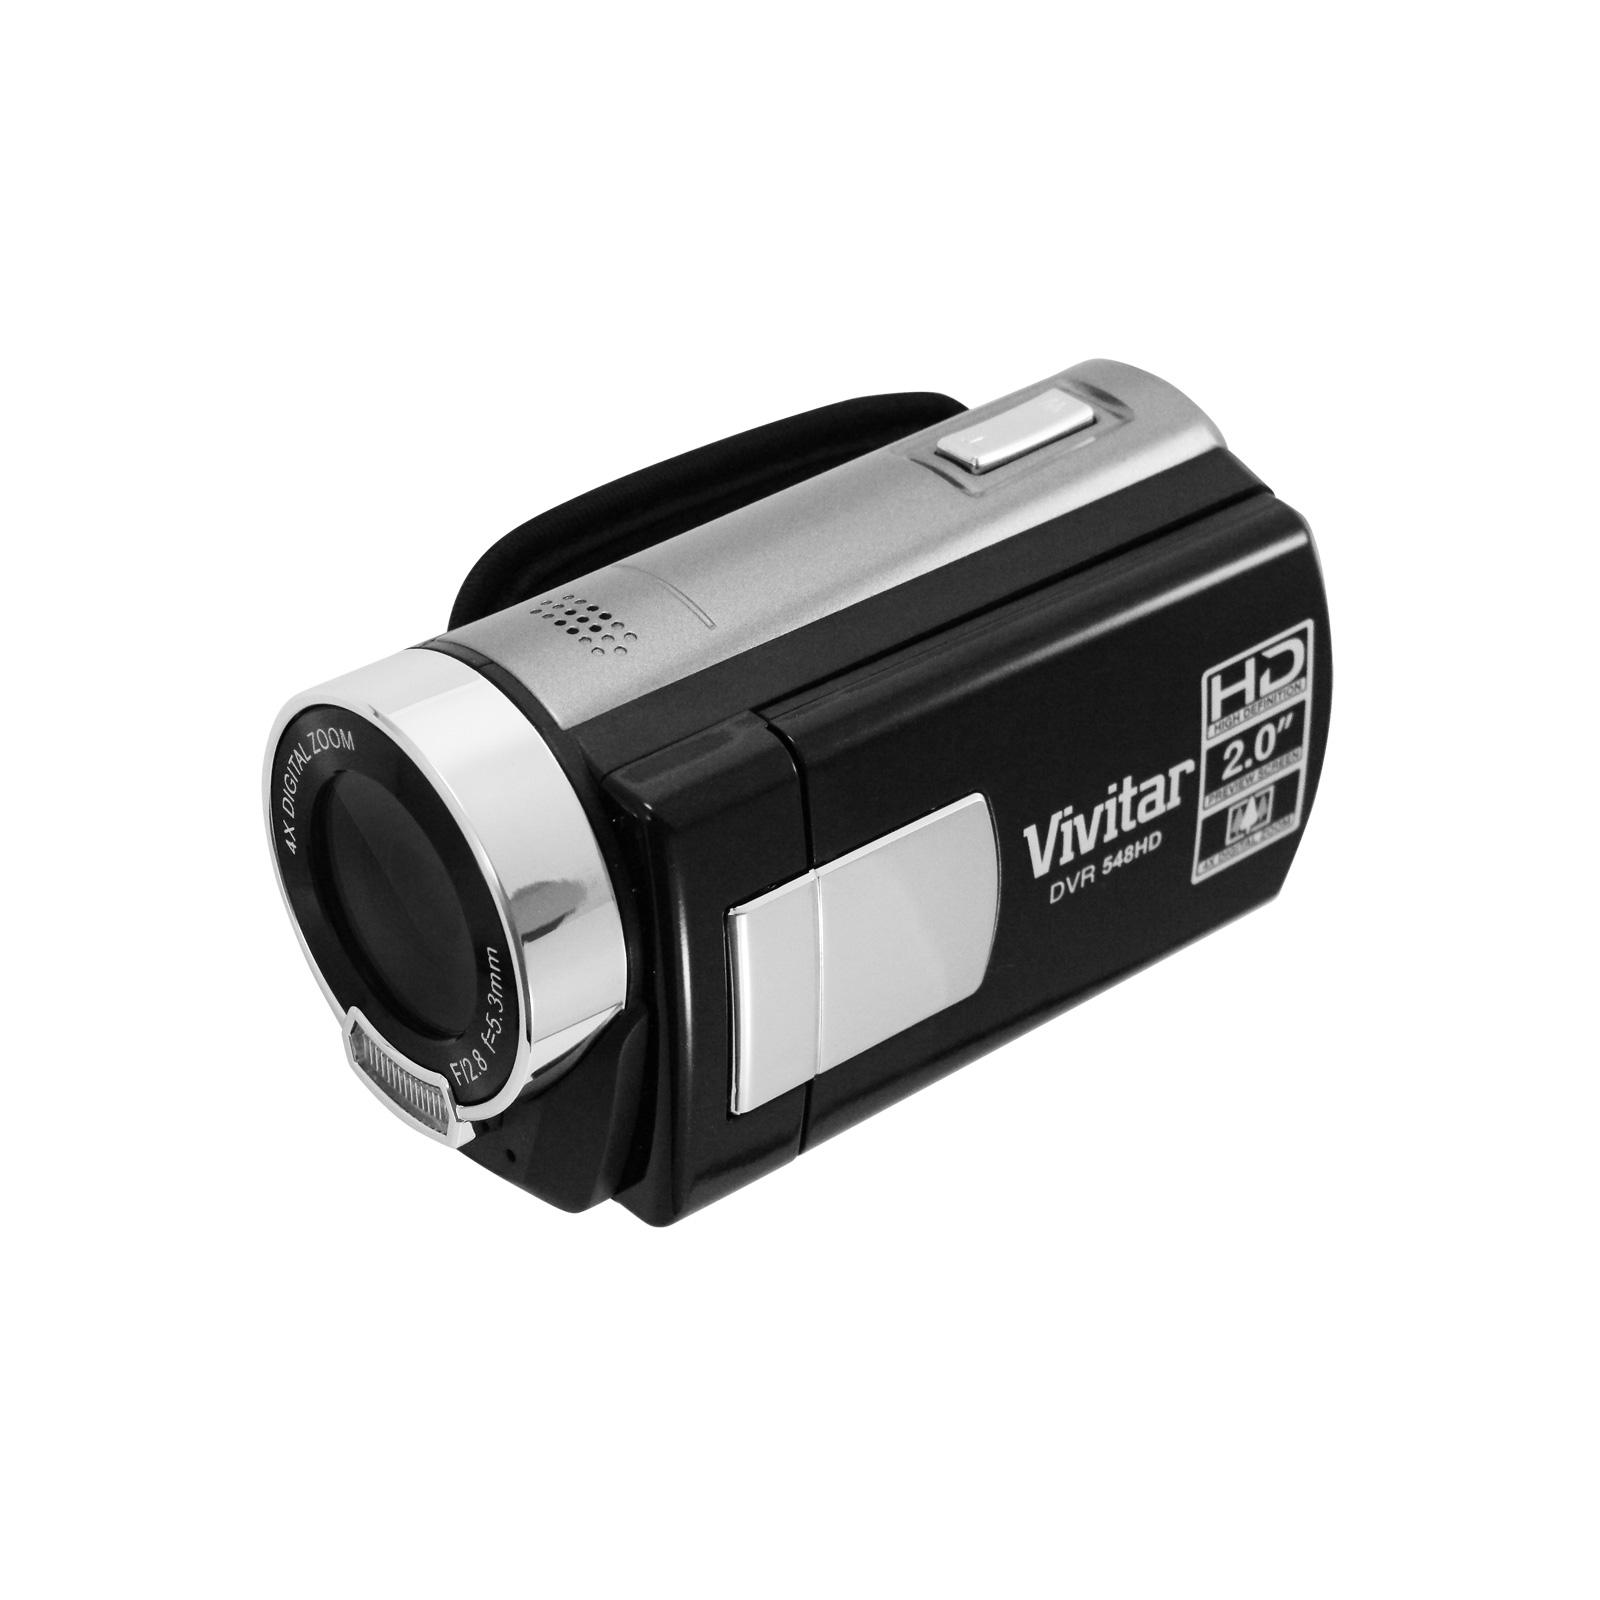 Digital Camcorder<br> 548HD Videokamera<br>8.1 Mega Pixel